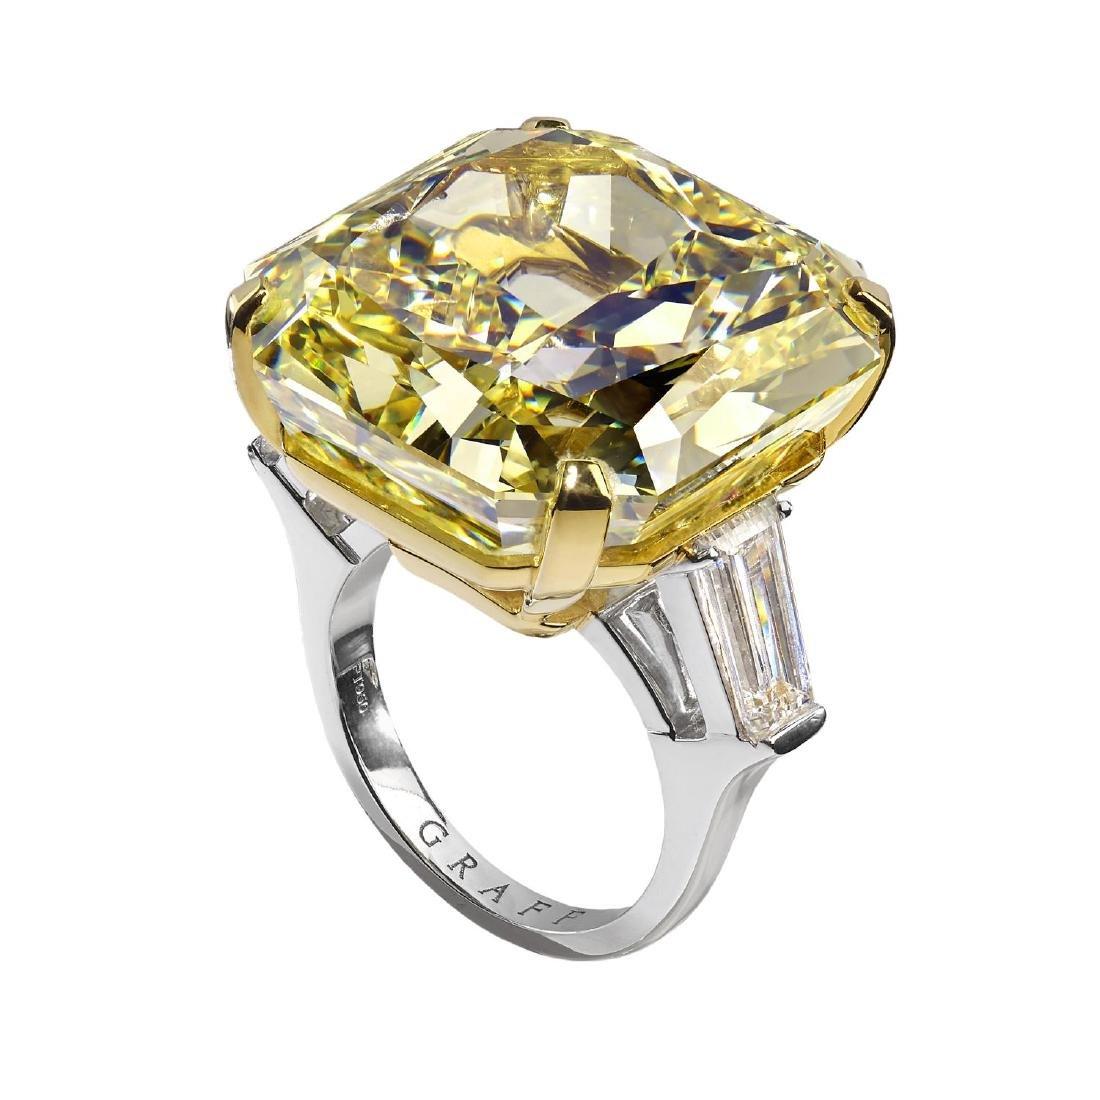 GRAFF - a Fancy Intense Yellow diamond ring. The